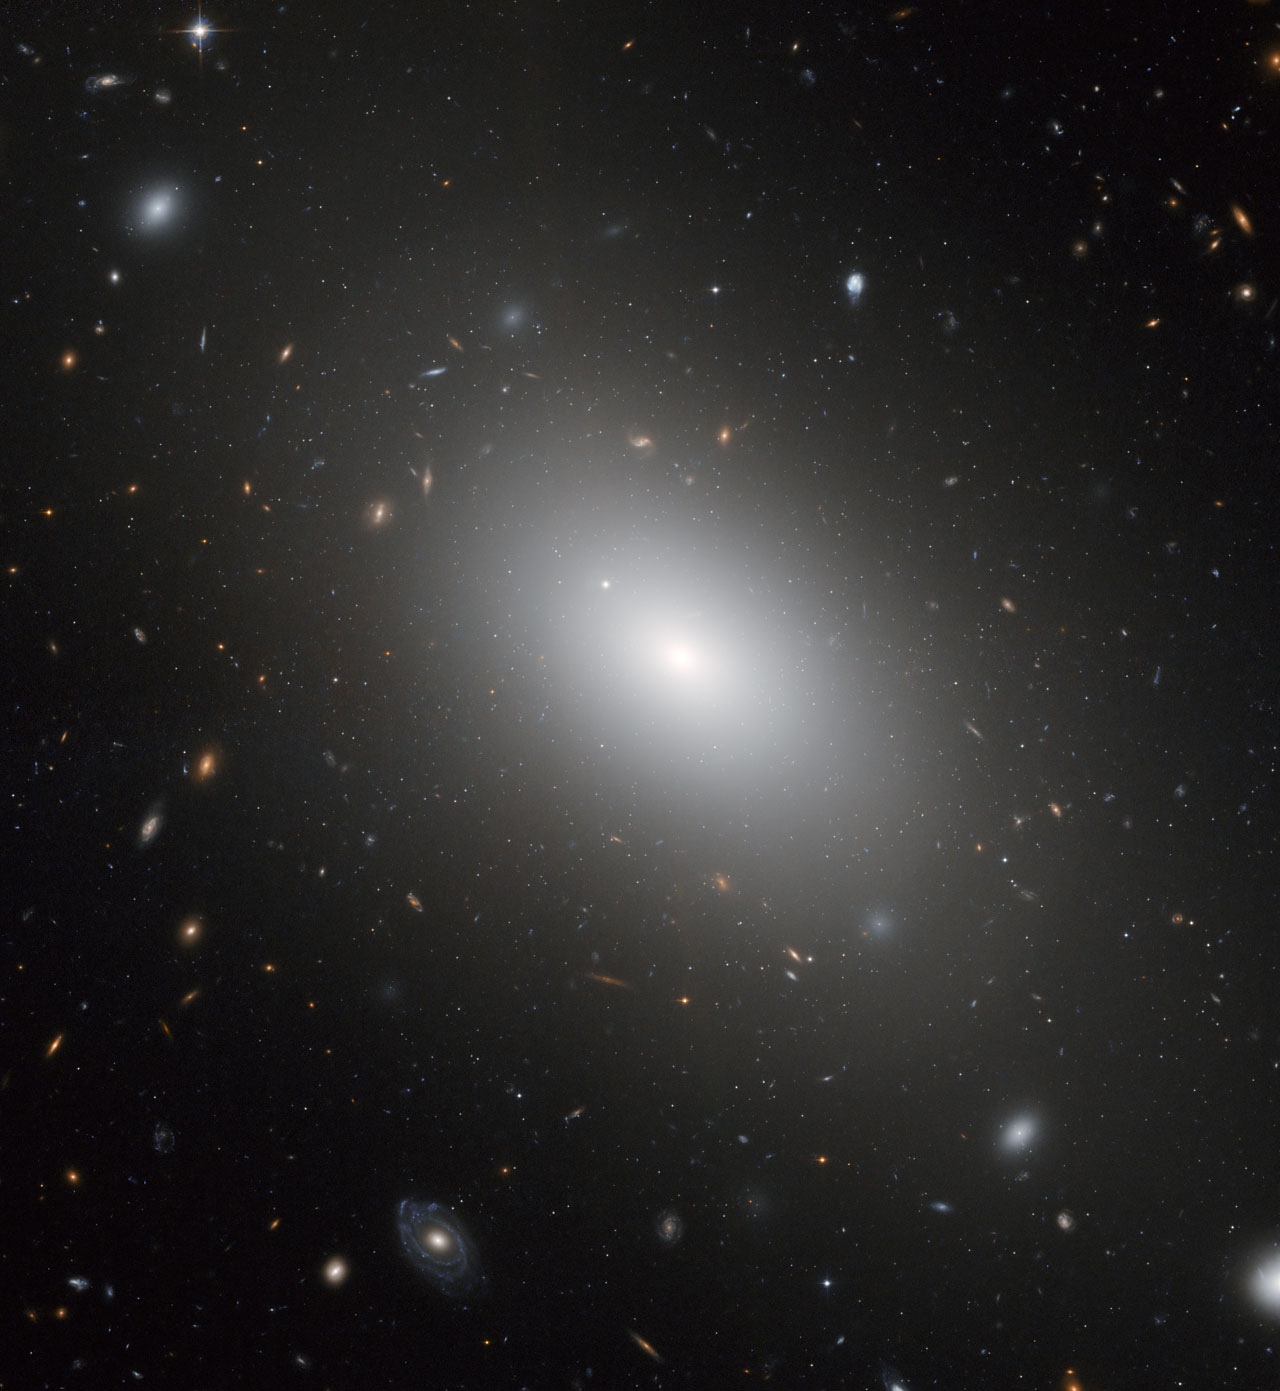 Giant elliptical galaxy NGC 1132